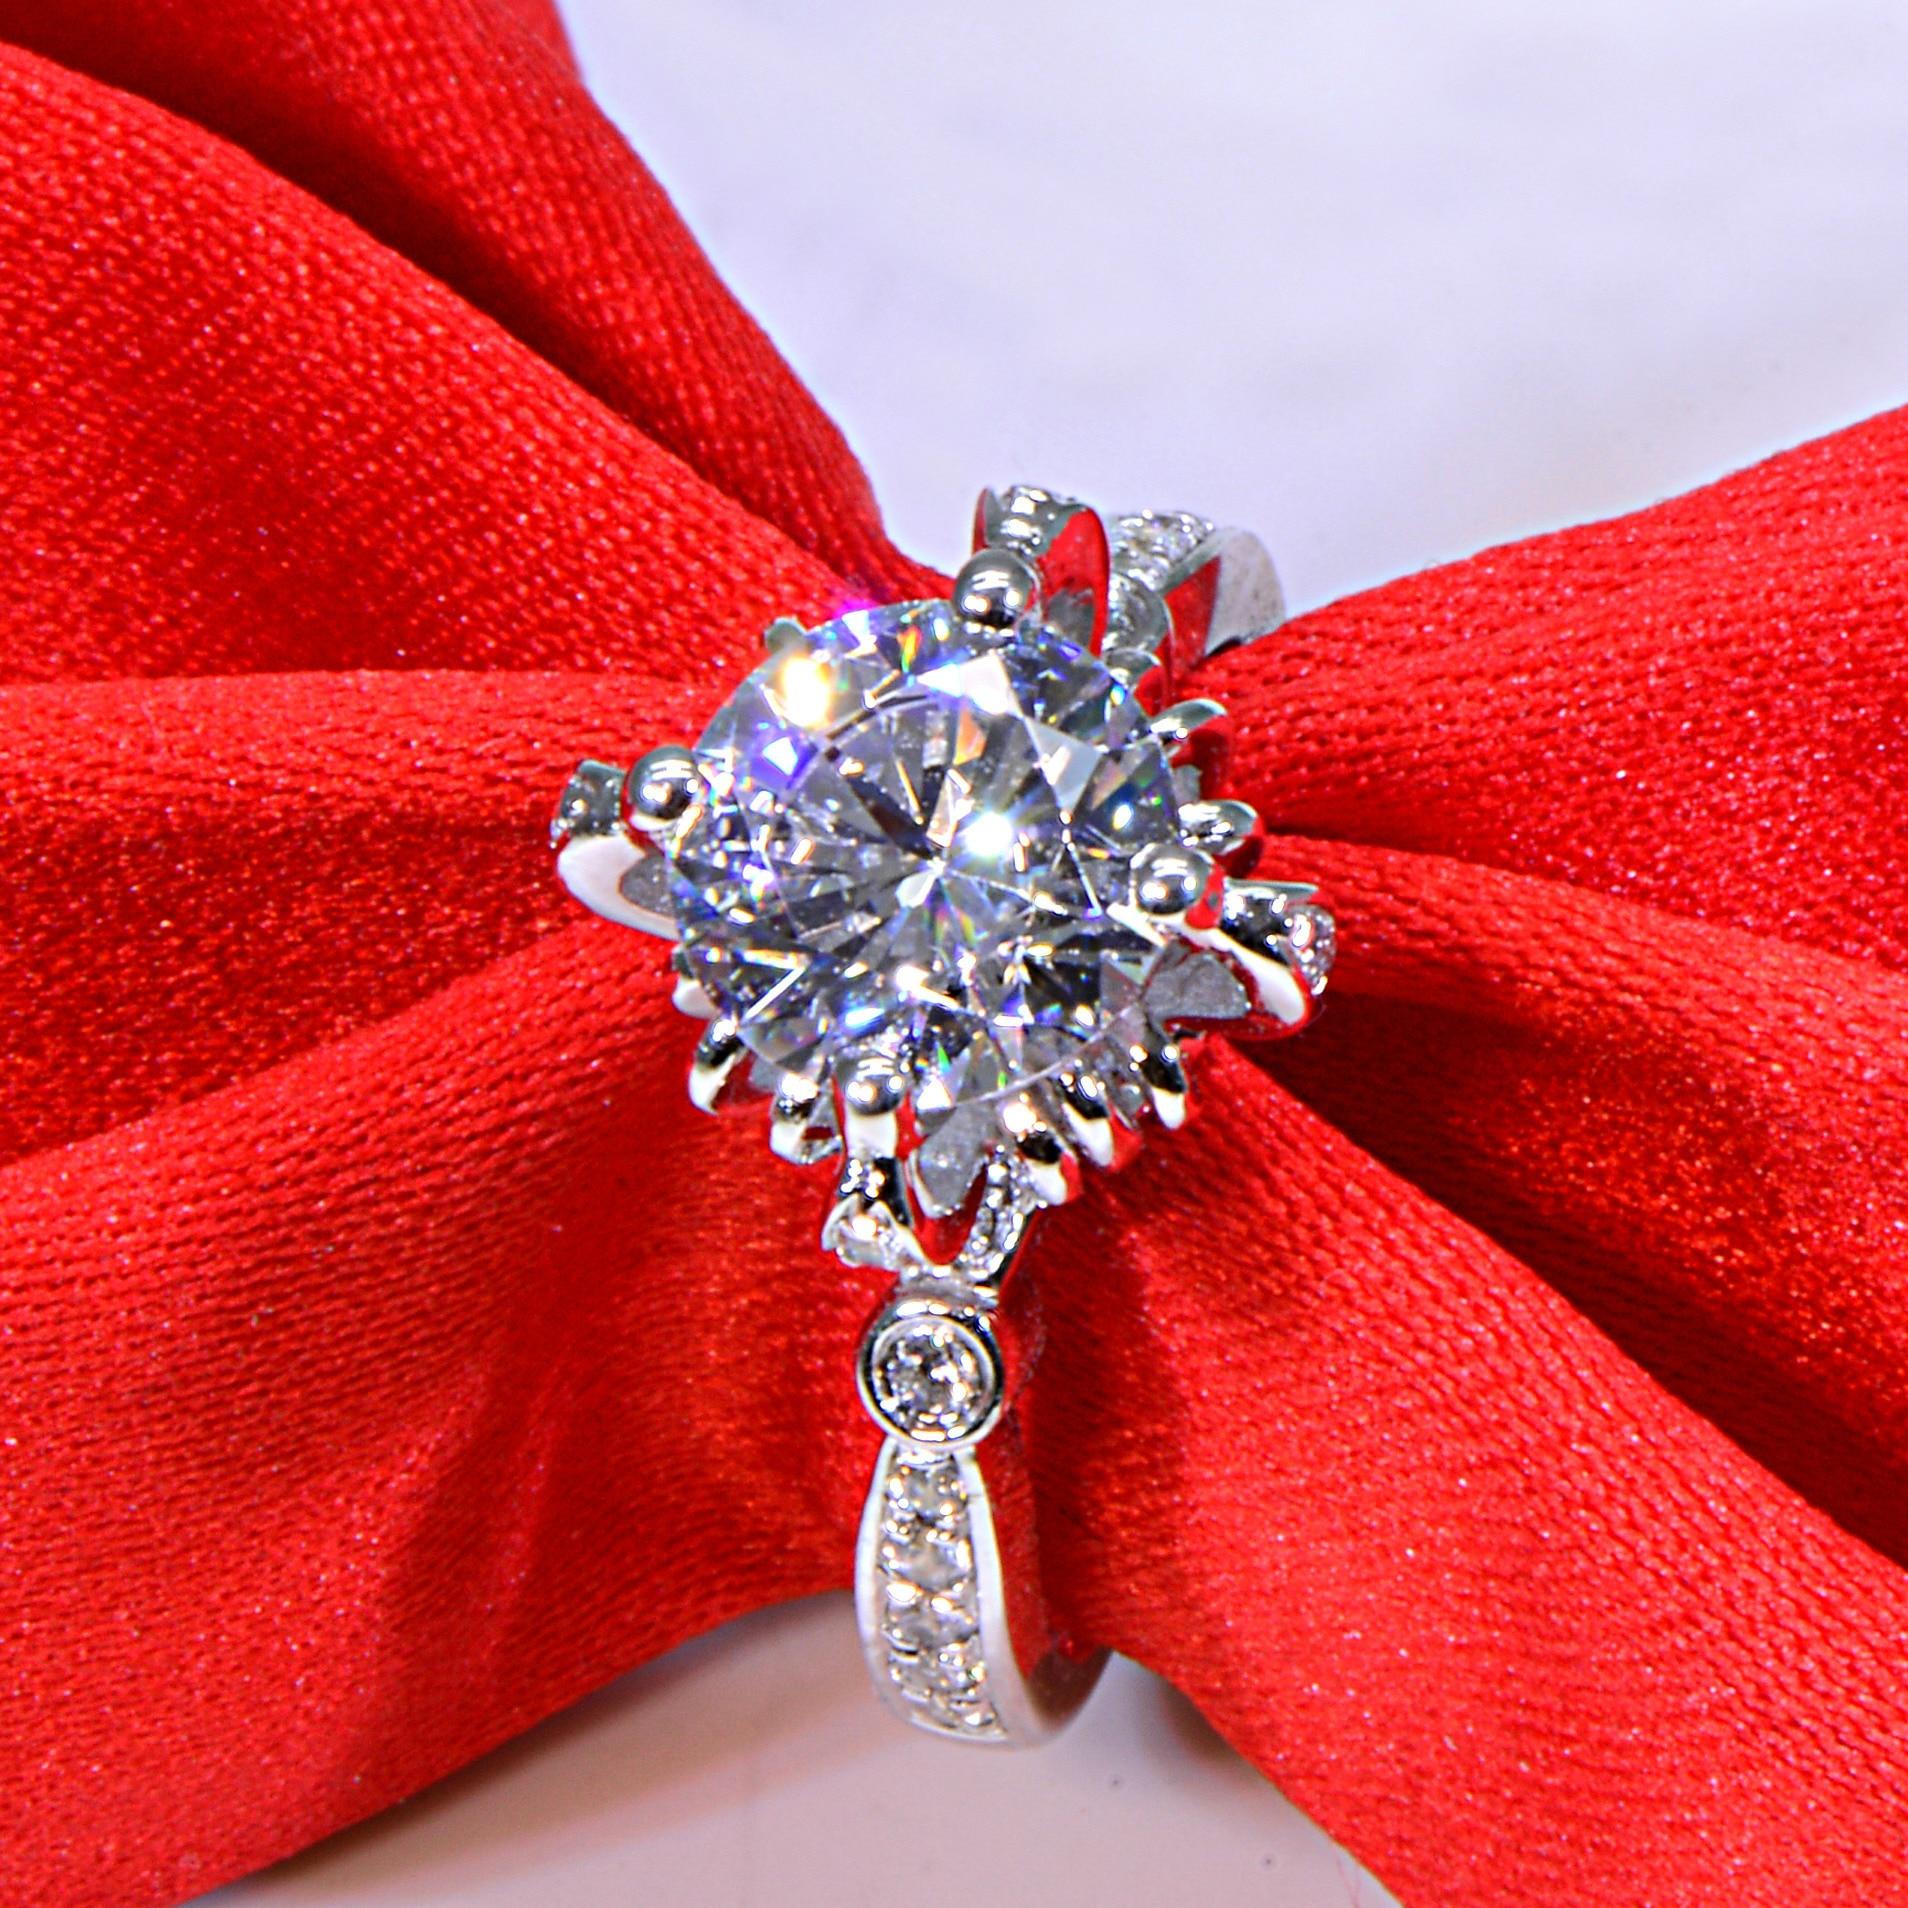 Original 2 ct 925 sterling silver flower bloom wedding lover ring jewelry for women (JSA)Original 2 ct 925 sterling silver flower bloom wedding lover ring jewelry for women (JSA)